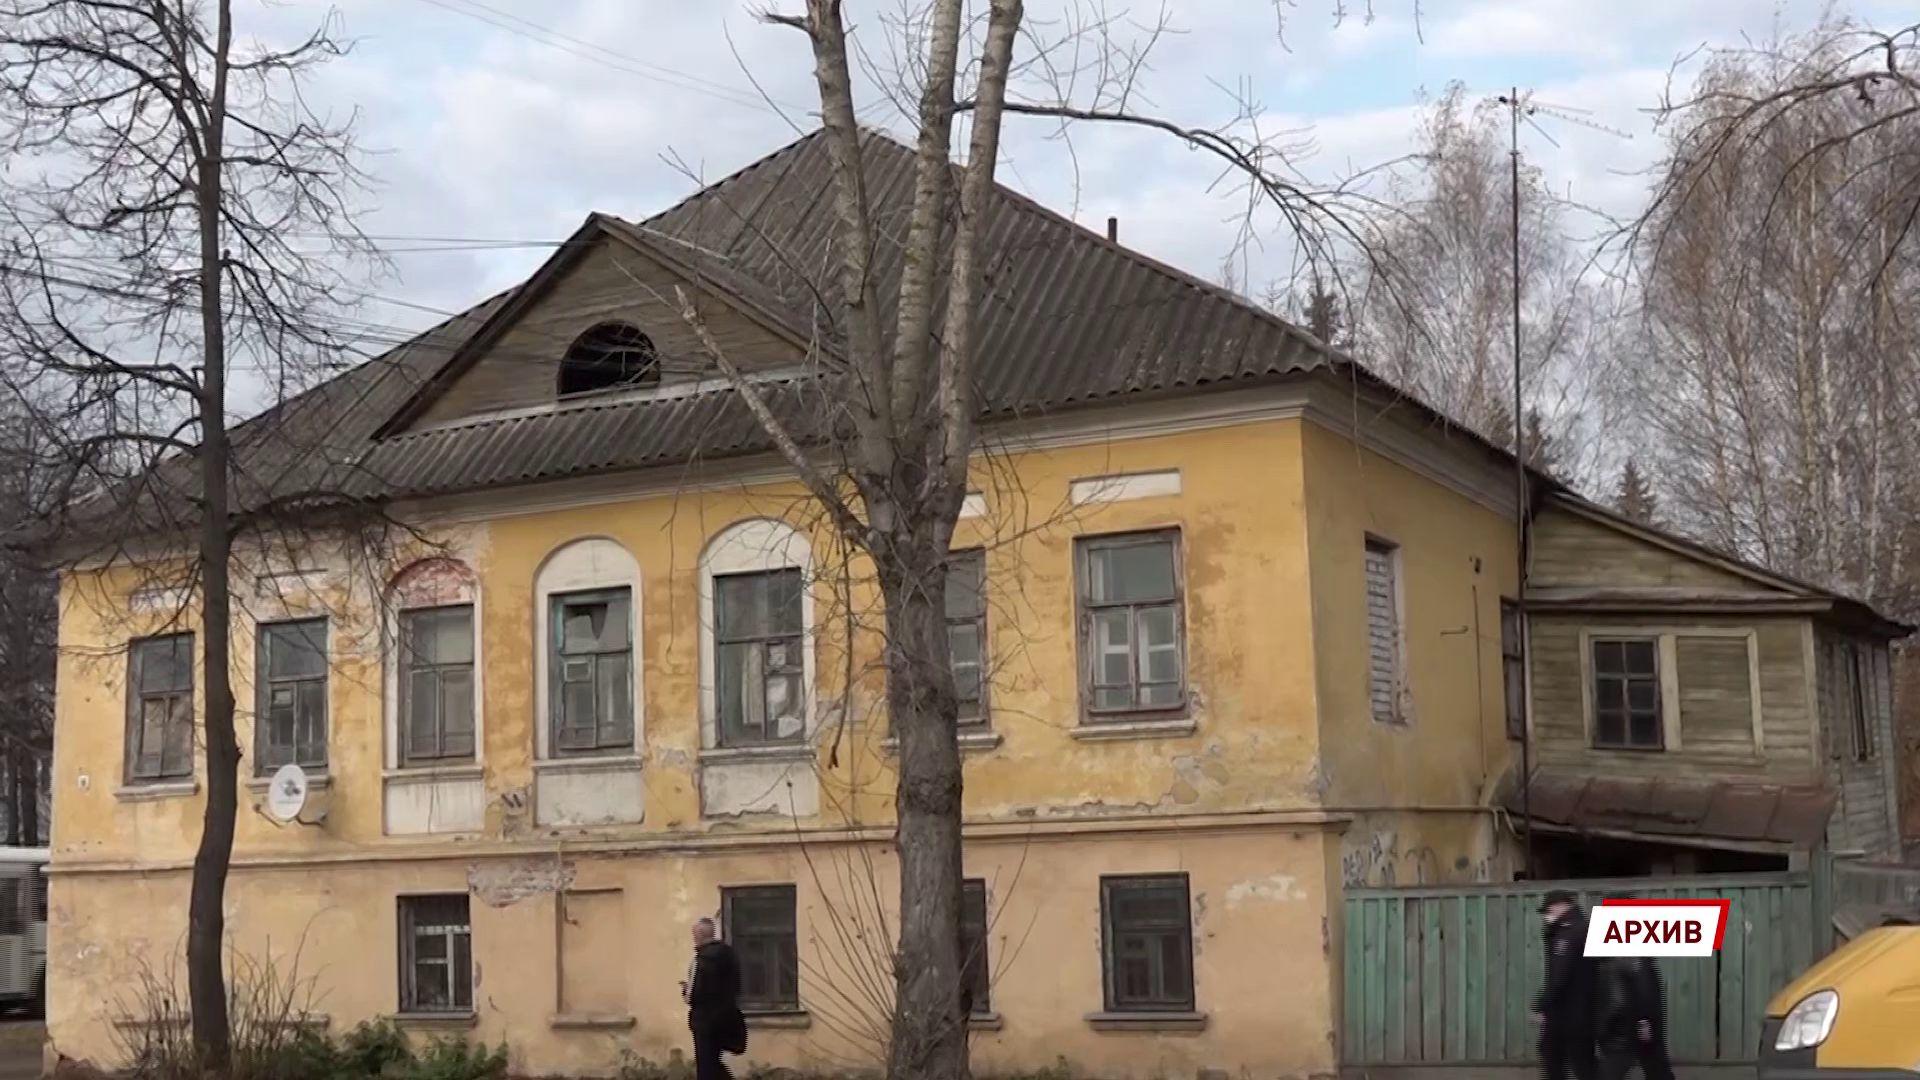 Ярославна предстанет перед судом за фиктивную постановку на учет иностранцев